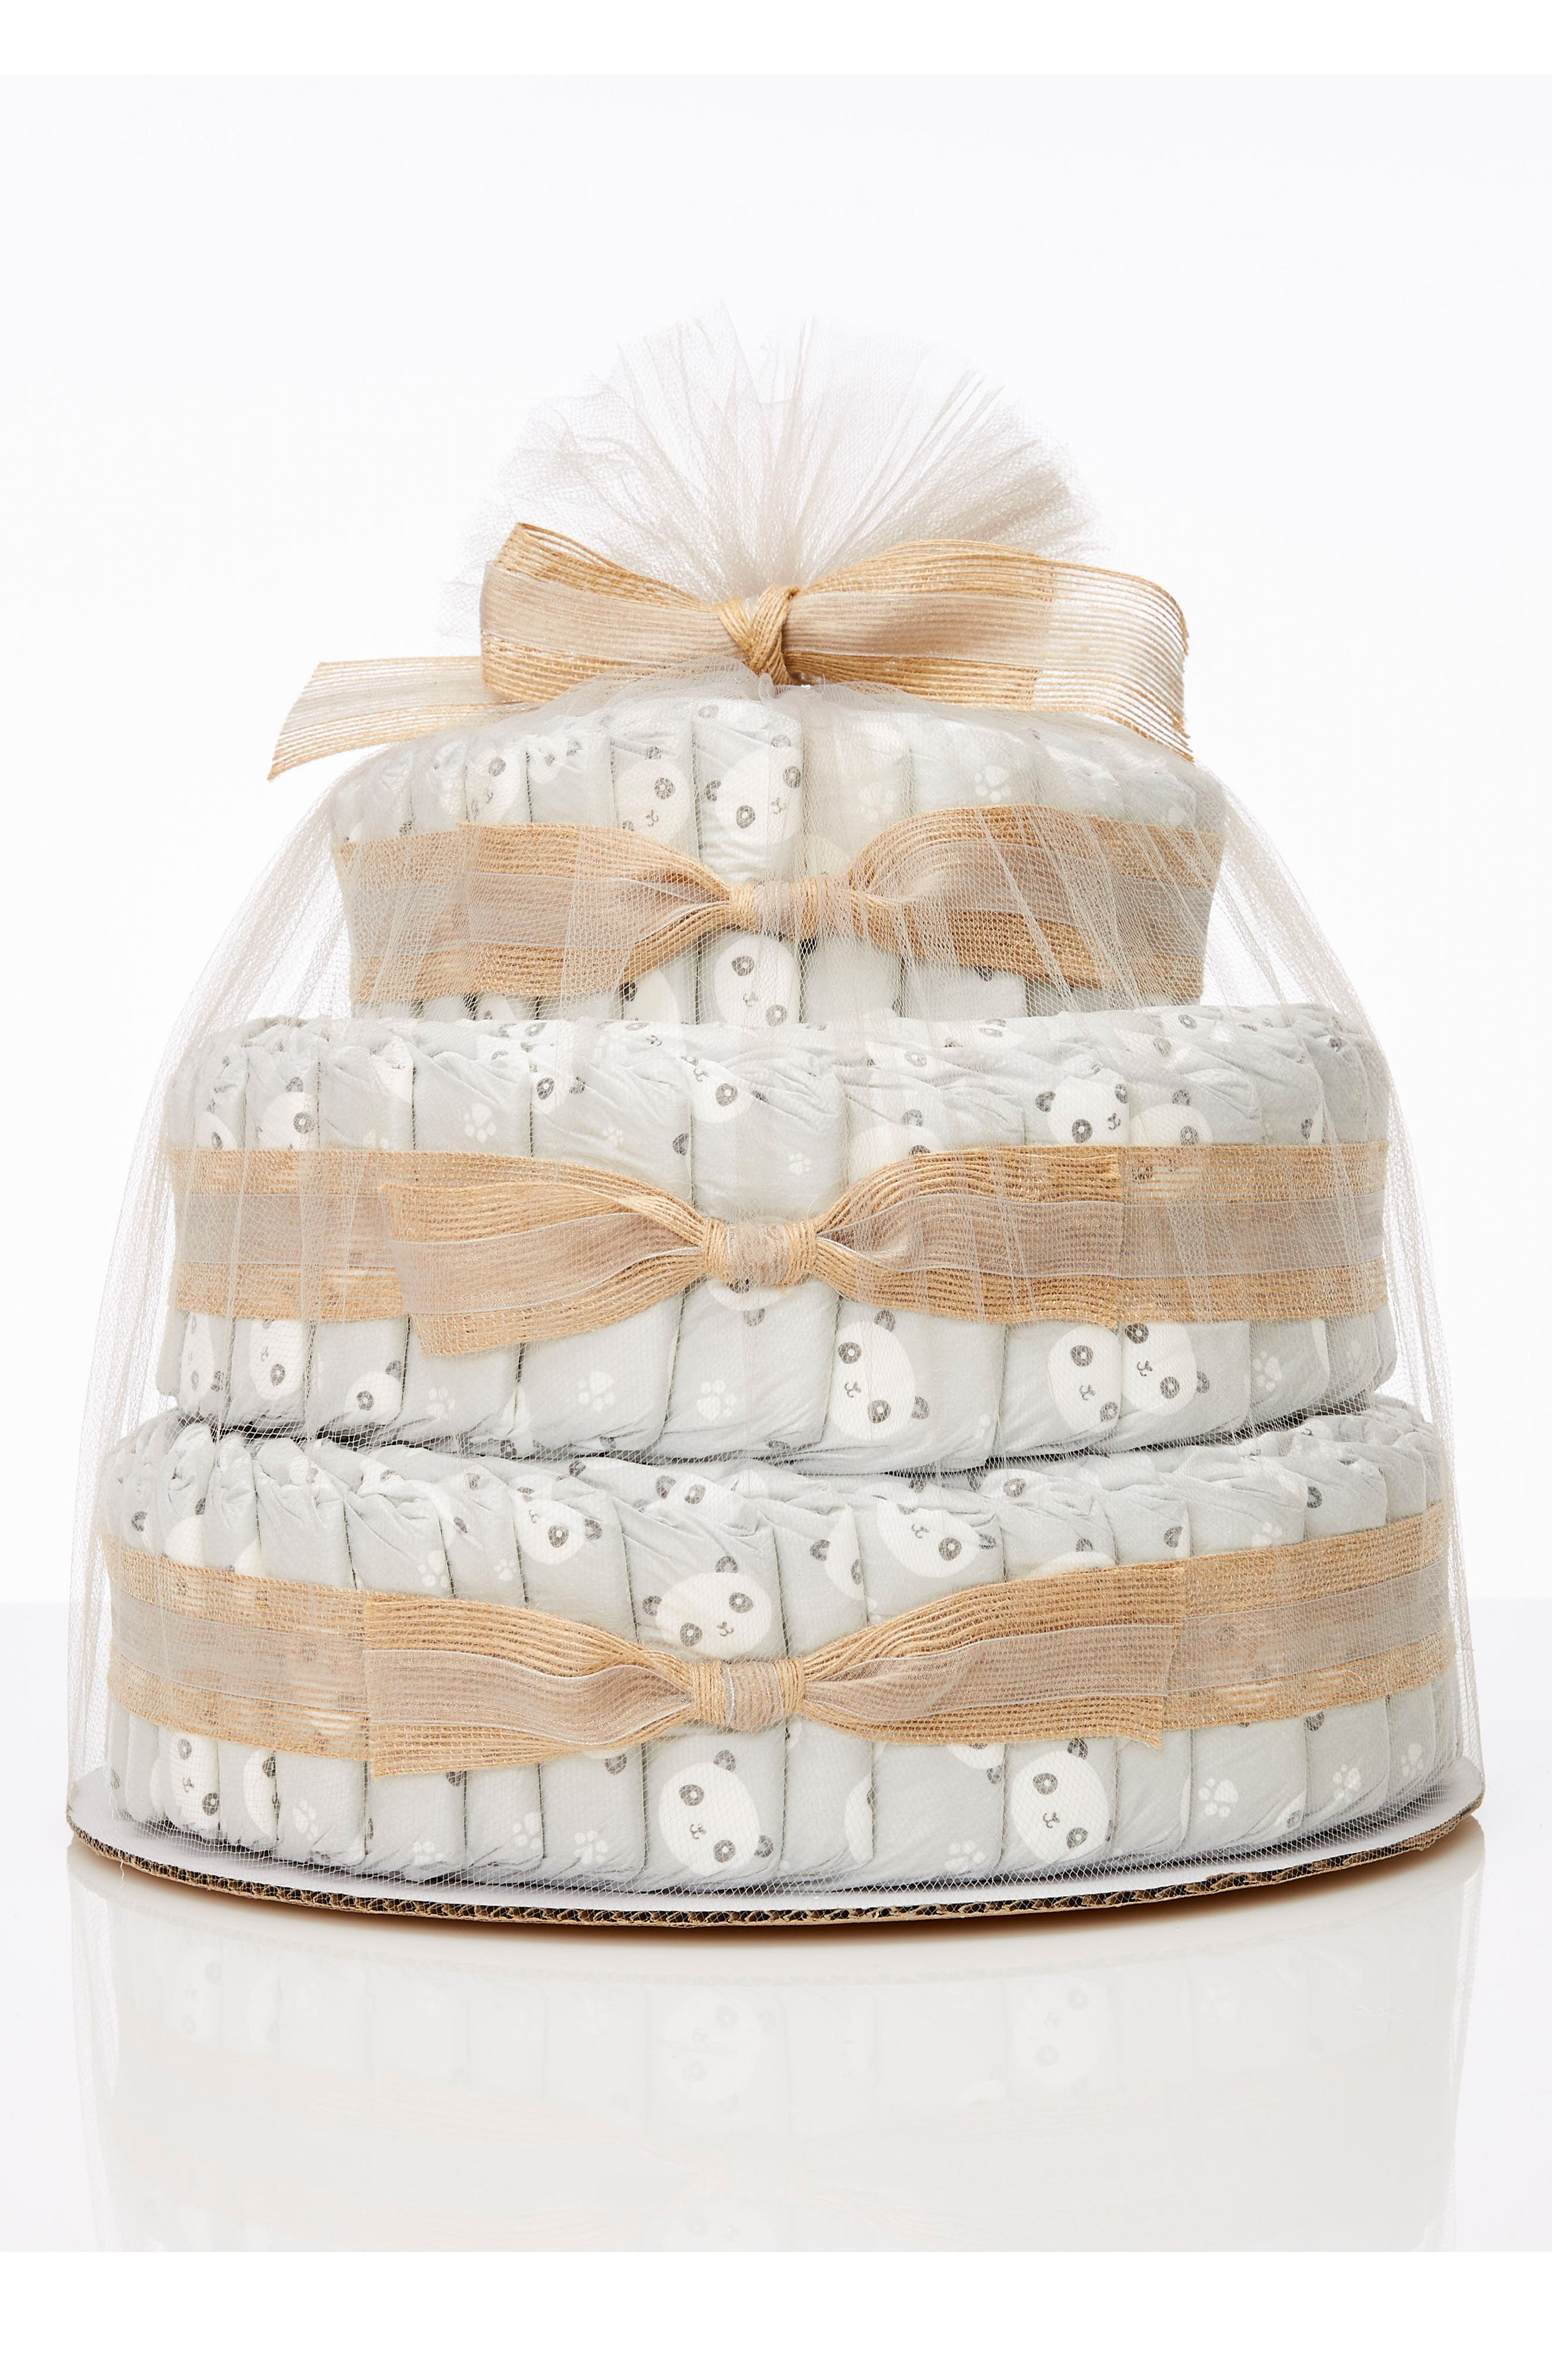 Large Diaper Cake & Full-Size Essentials Set,                             Main thumbnail 1, color,                             Pandas